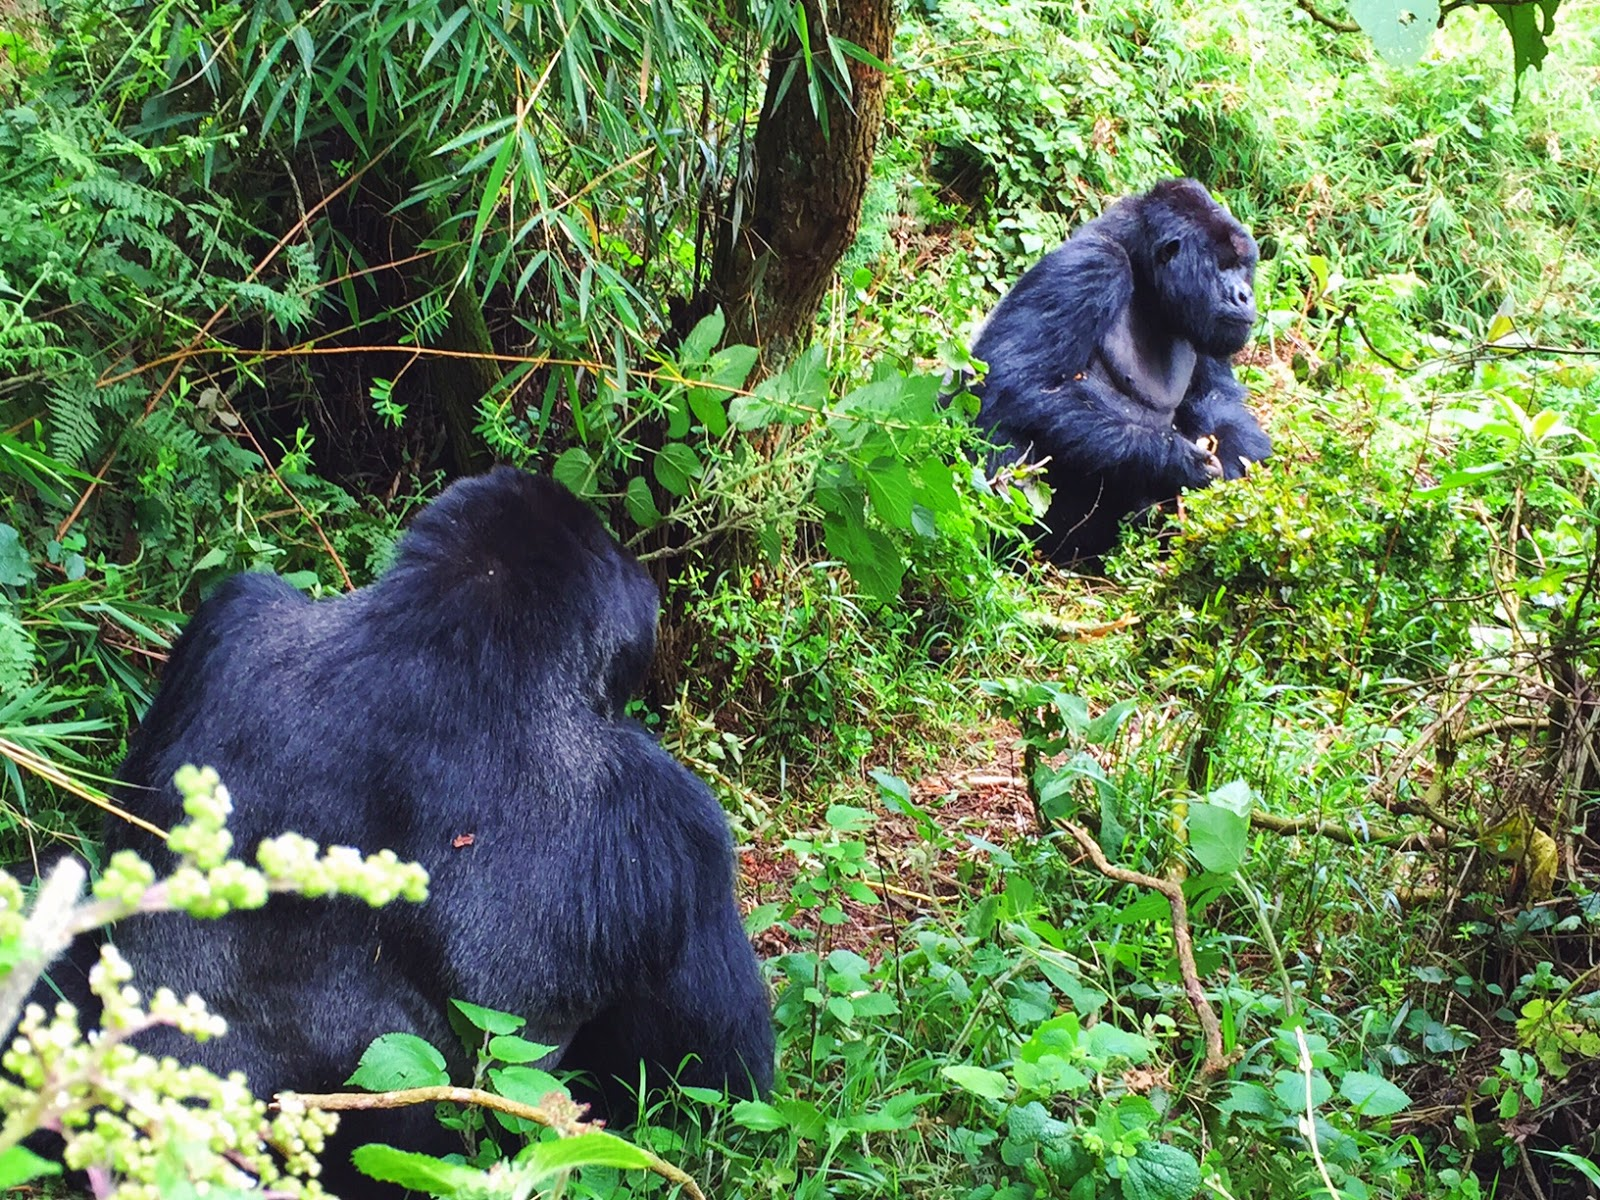 amahoro family mountain gorillas volcaoes national park rwanda africa